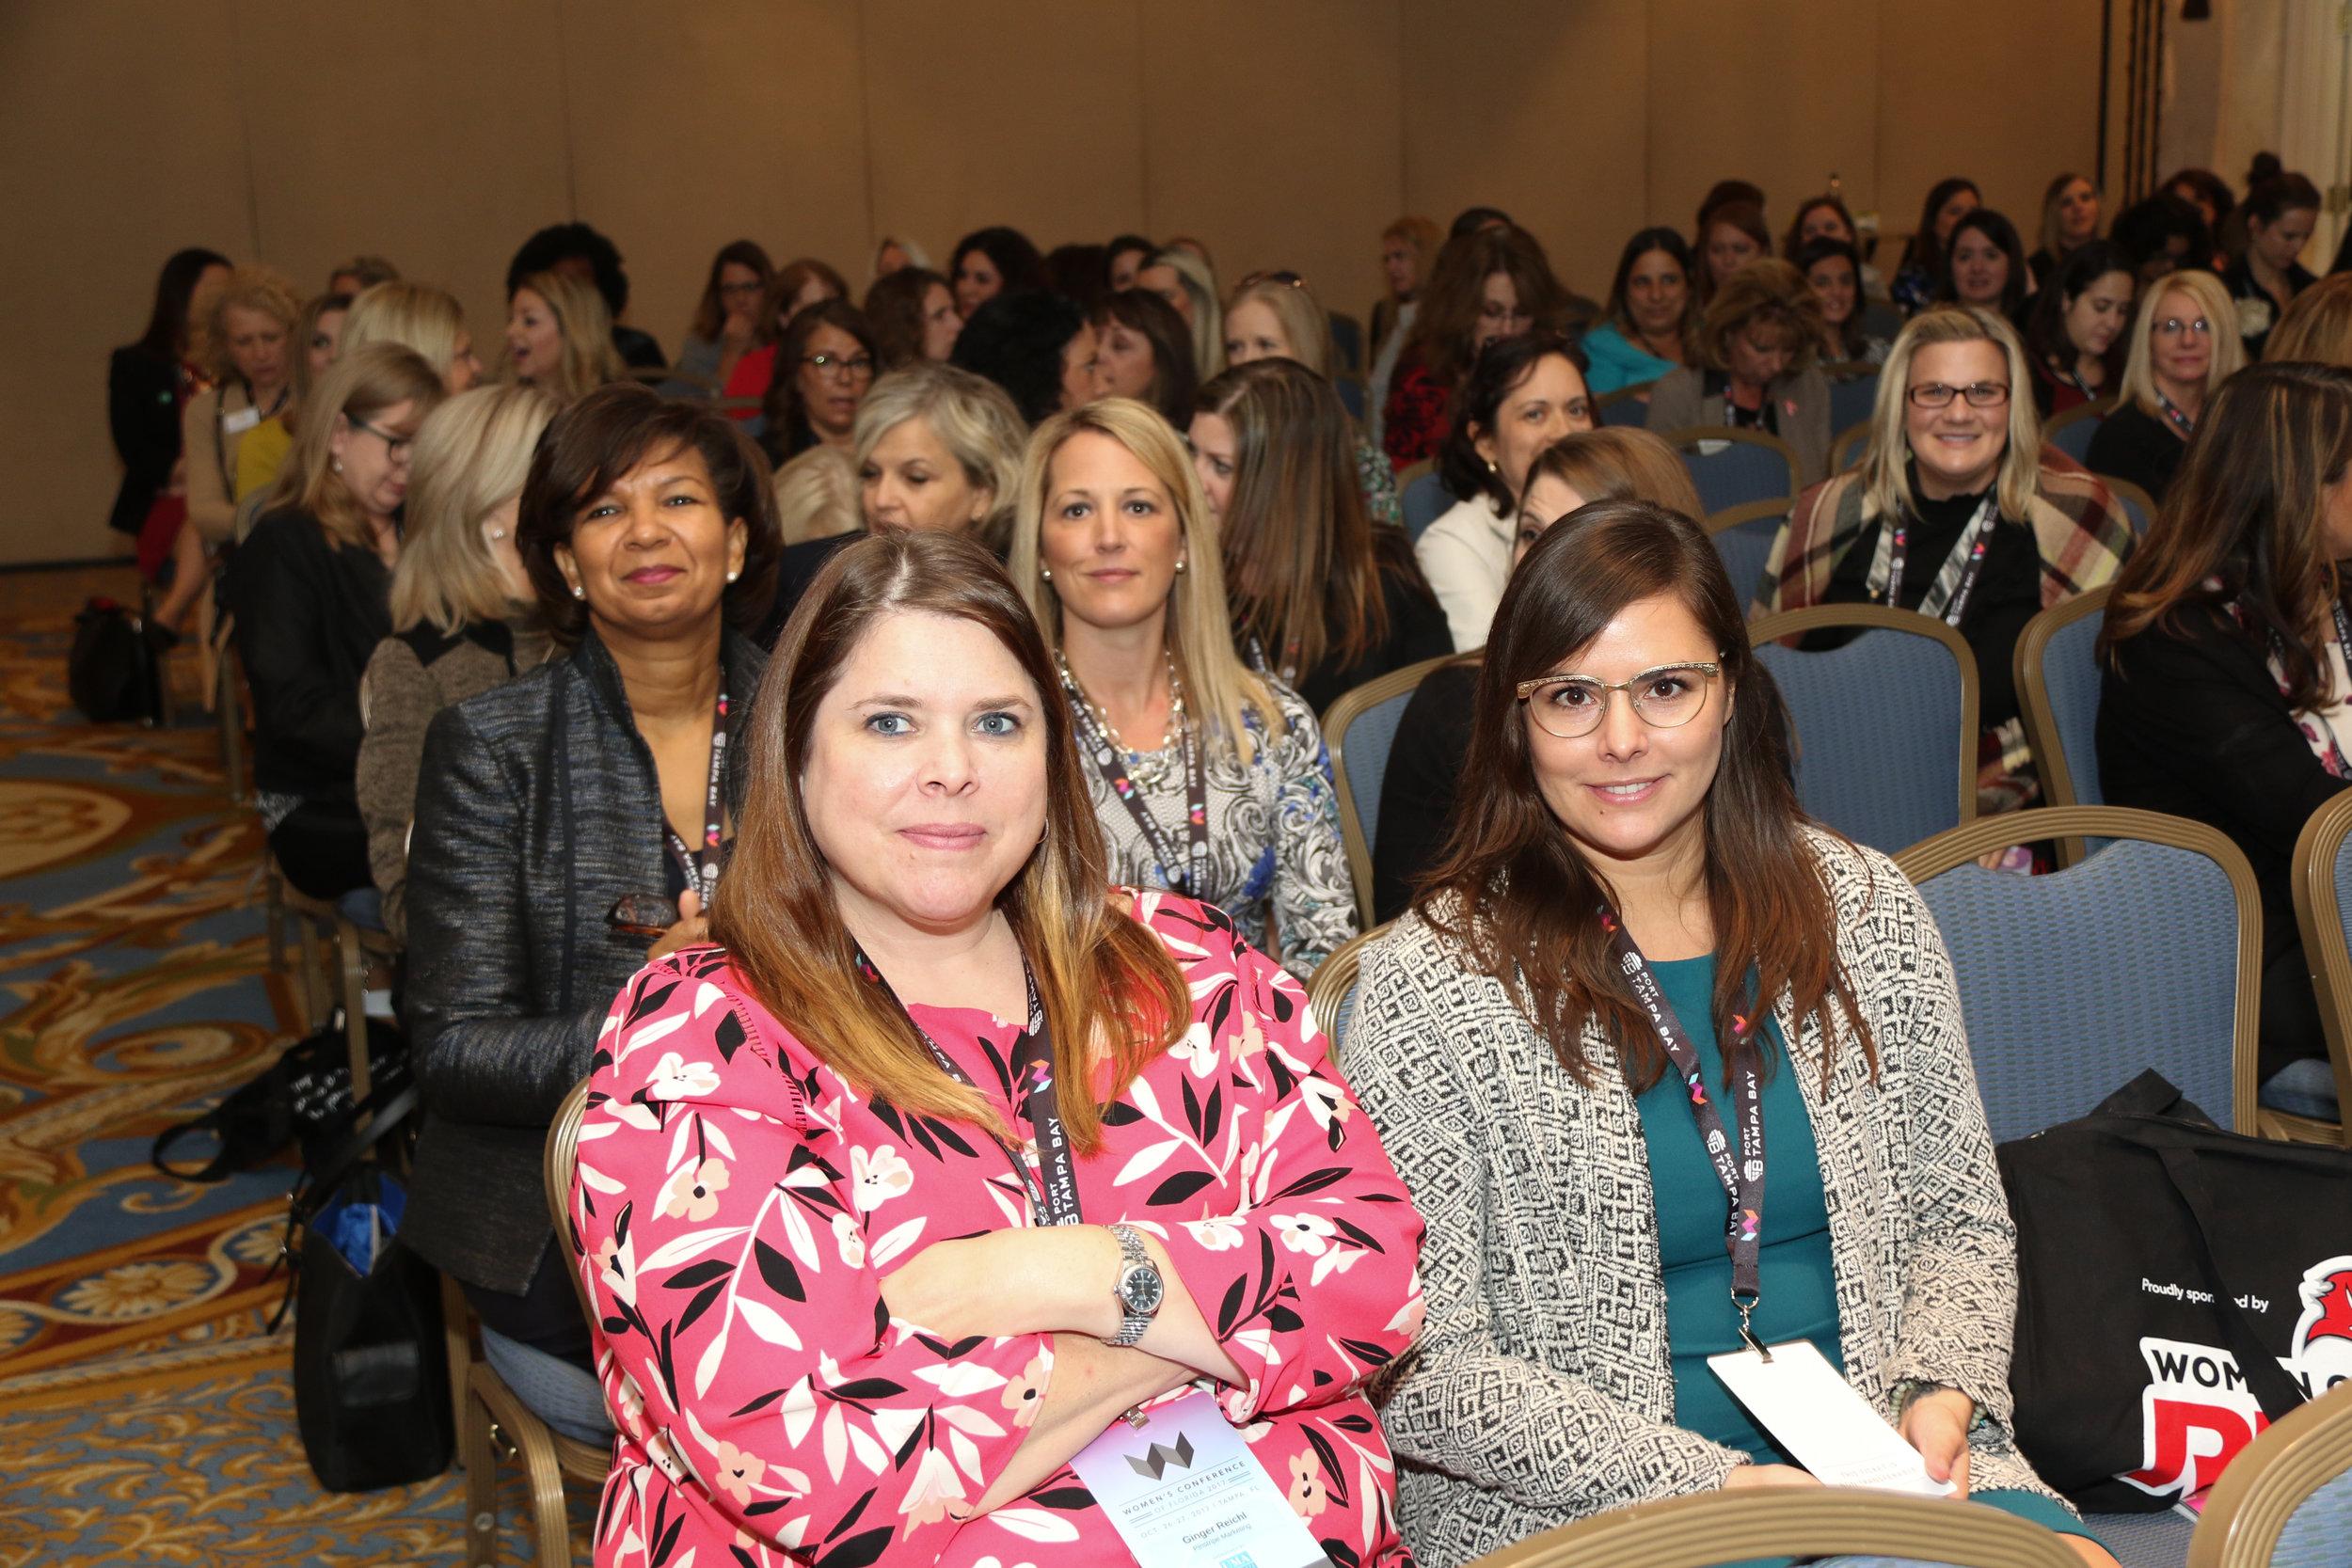 231_WomensConference_10-26-17.jpg